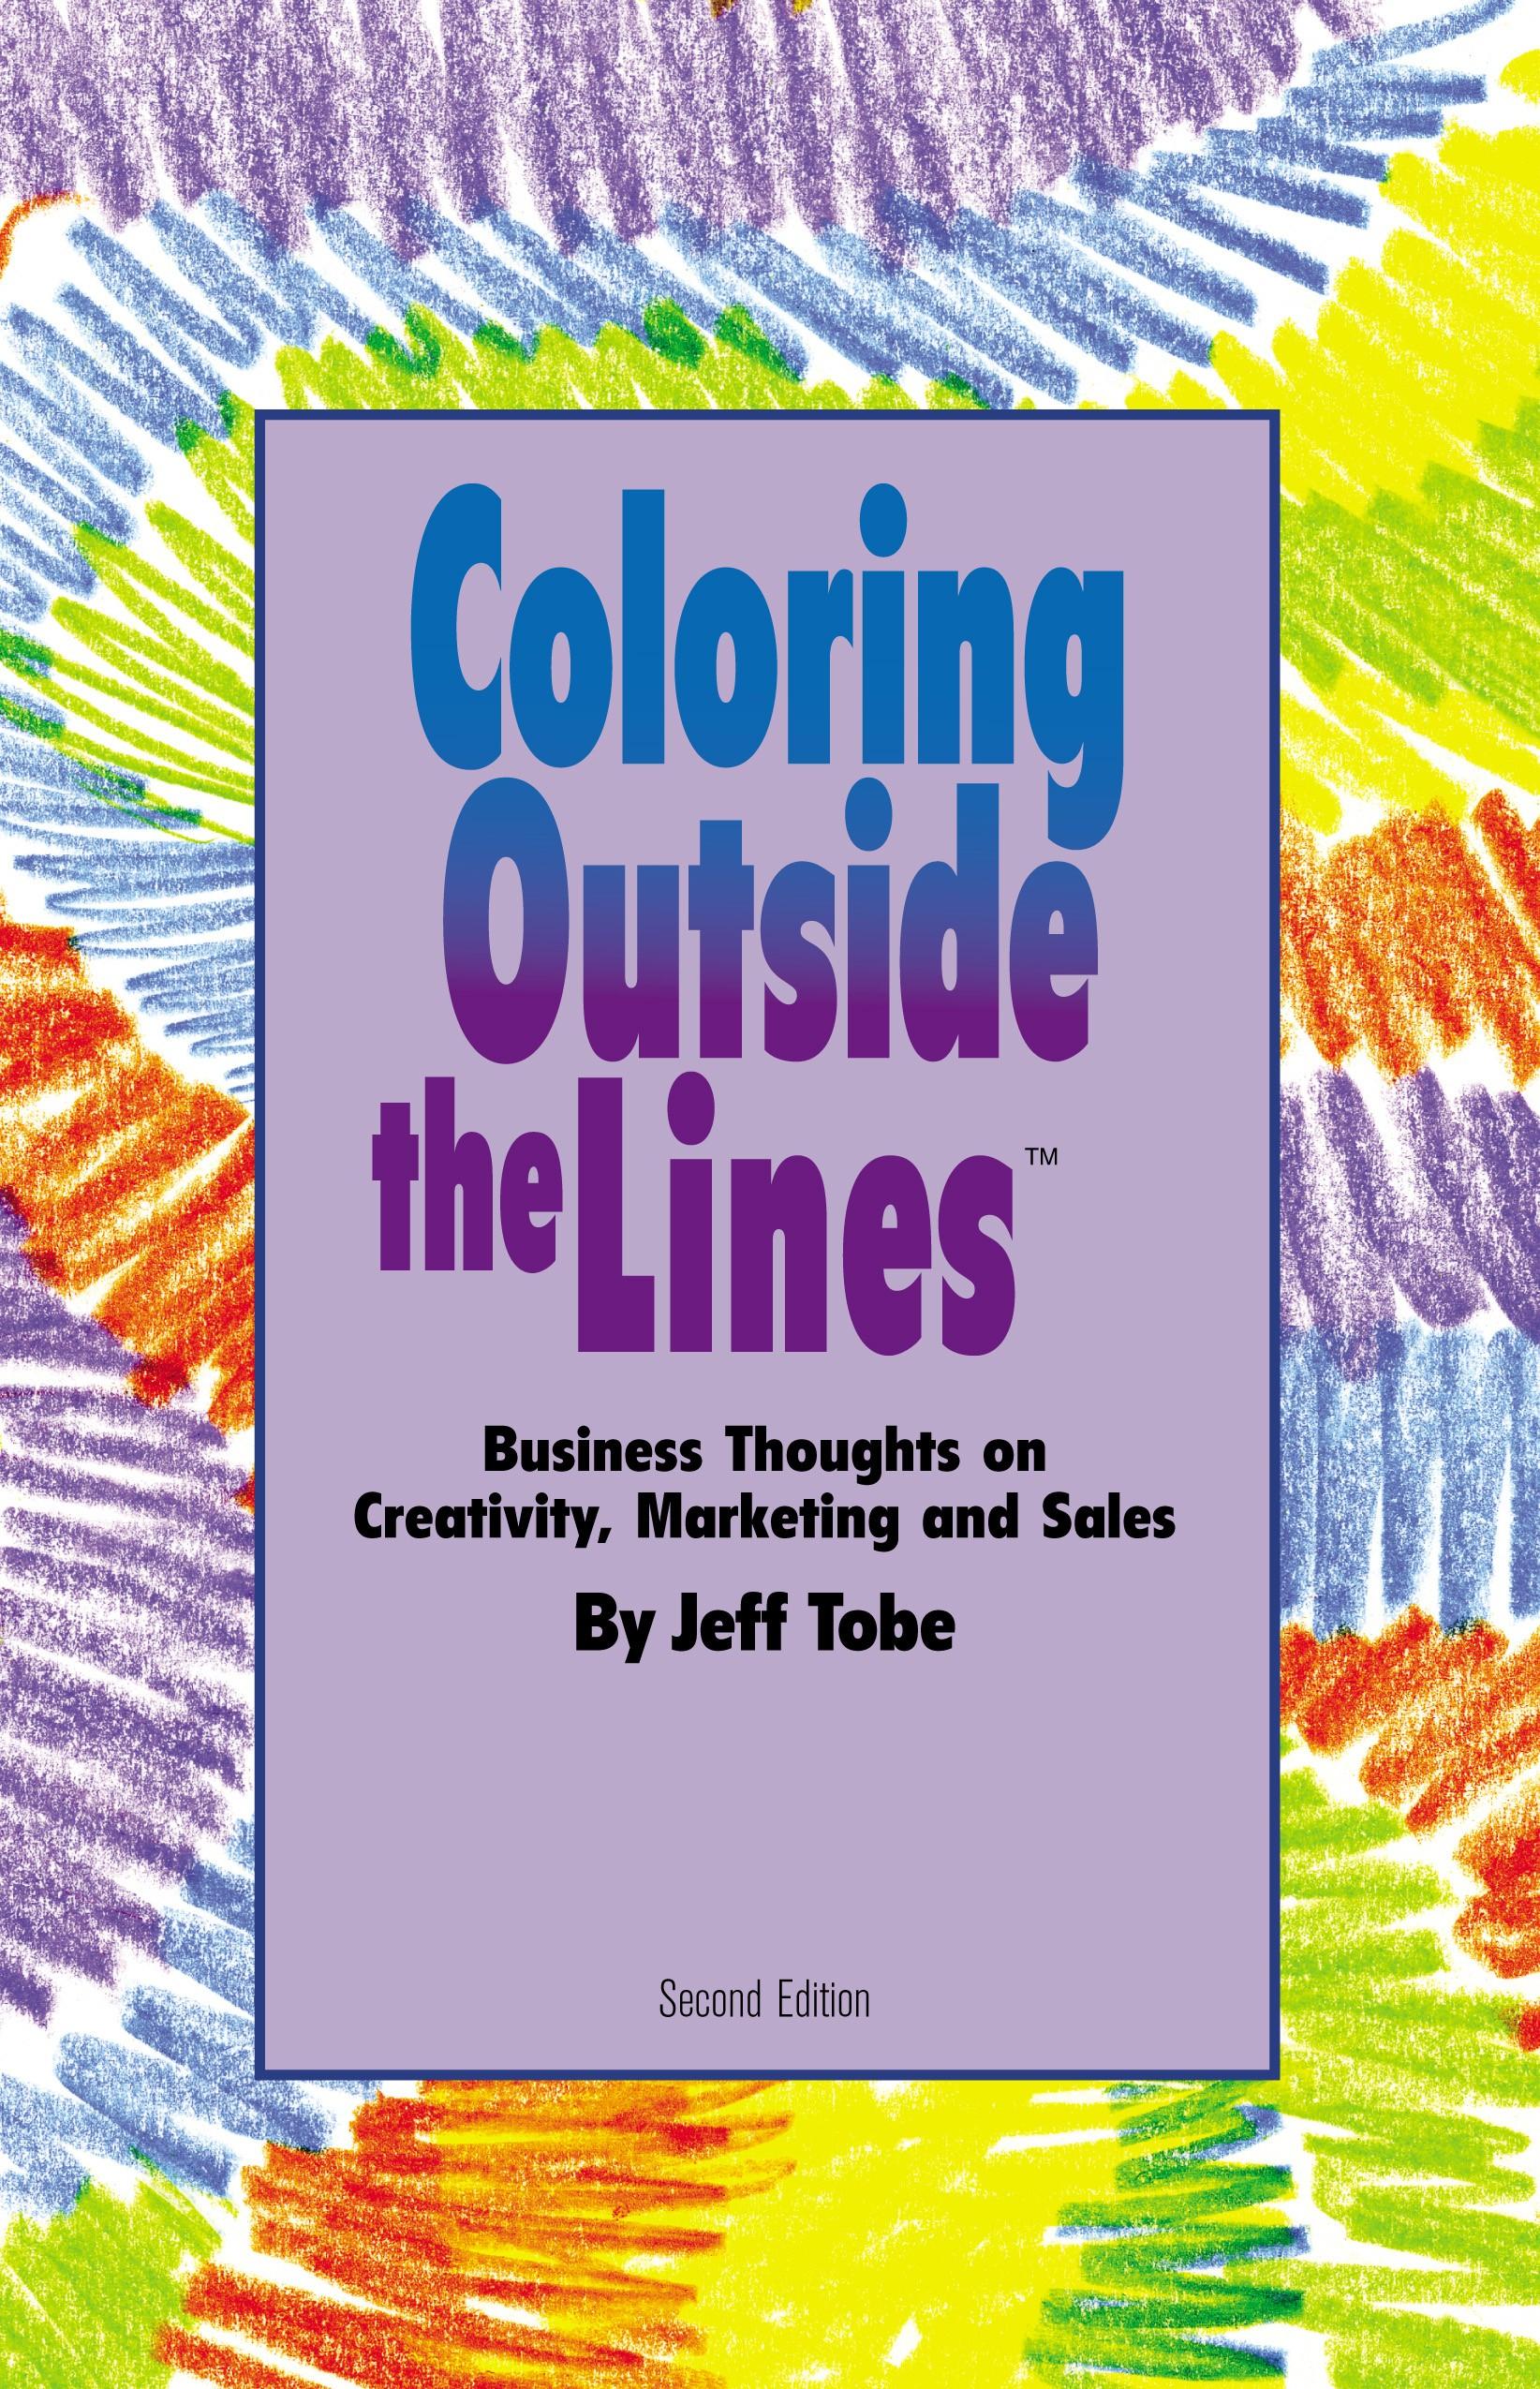 Jeff Tobe's hugely popular book!